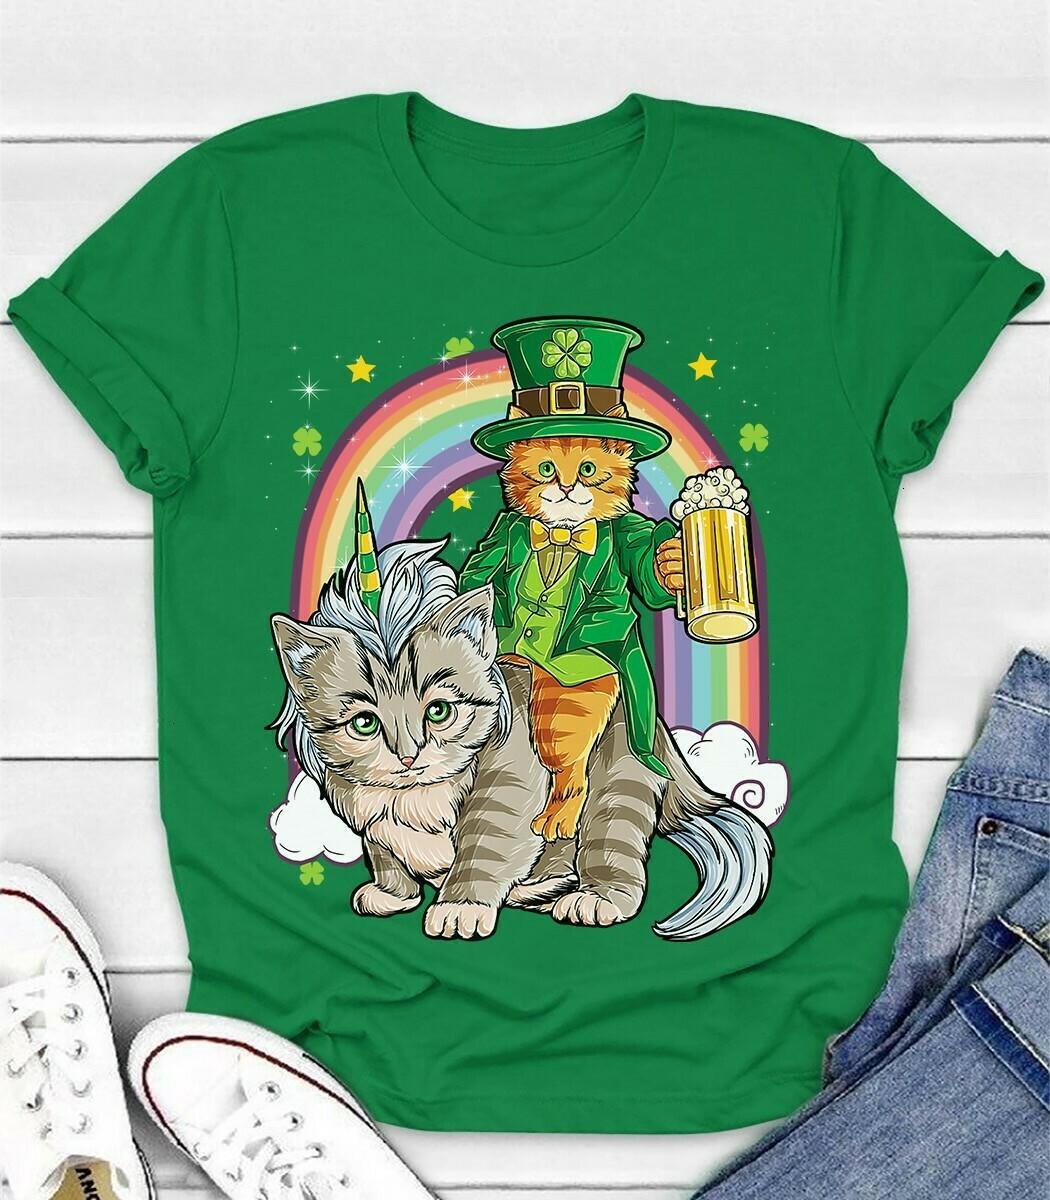 Cat Leprechaun drinking Beer Riding Caticorn Unicorn St Patricks Day Rainbow Gift for Cat Lovers Dad Mom Unisex T-Shirt Hoodie Sweatshirt Sweater Plus Size for Ladies Women Men Kids Youth Gifts Tee